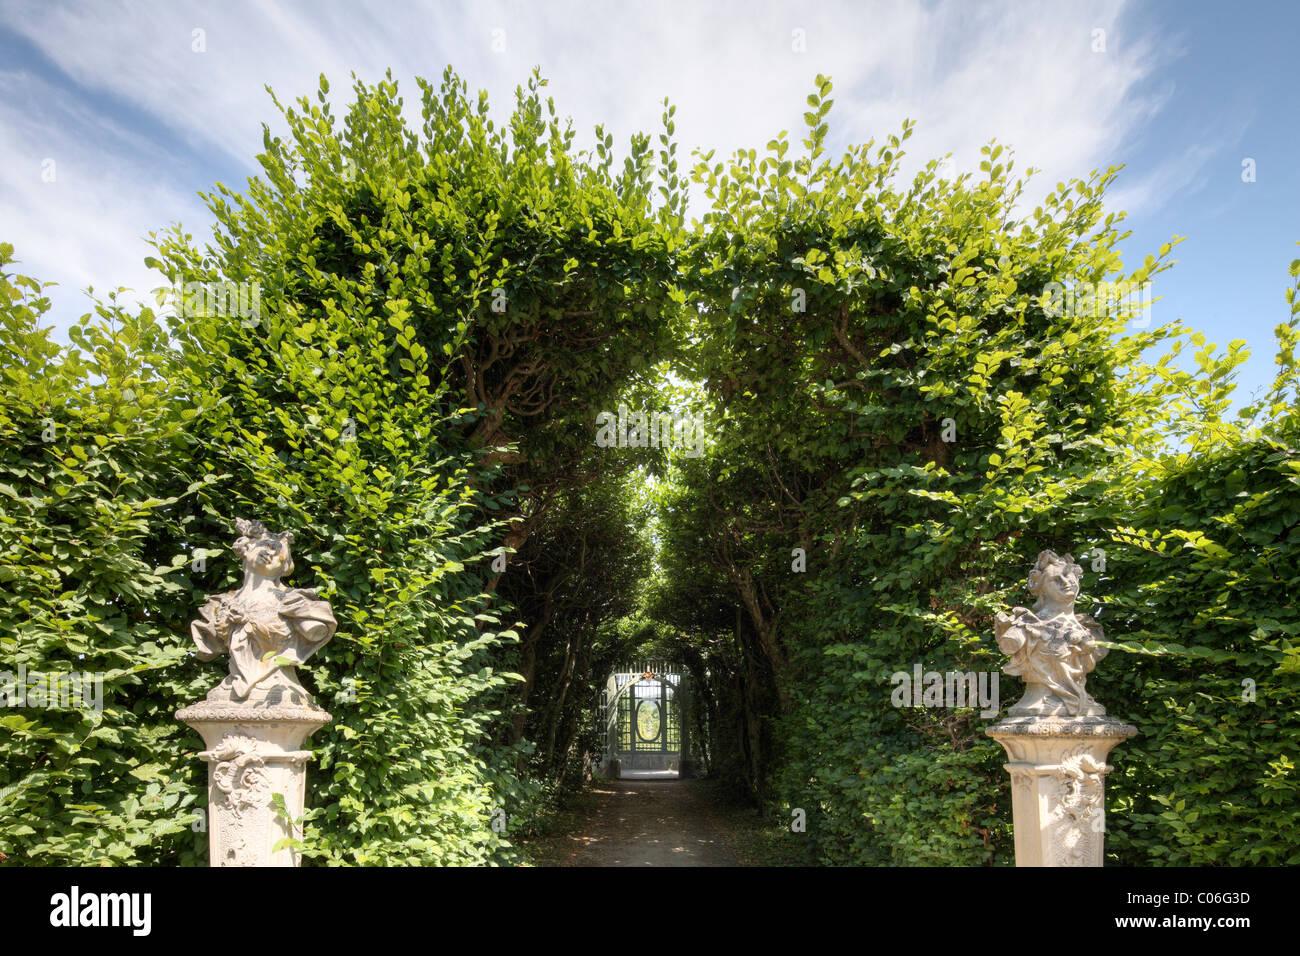 Rococo garden in Veitshoechheim, Main-Franconia region, Lower Franconia, Franconia, Bavaria, Germany, Europe - Stock Image